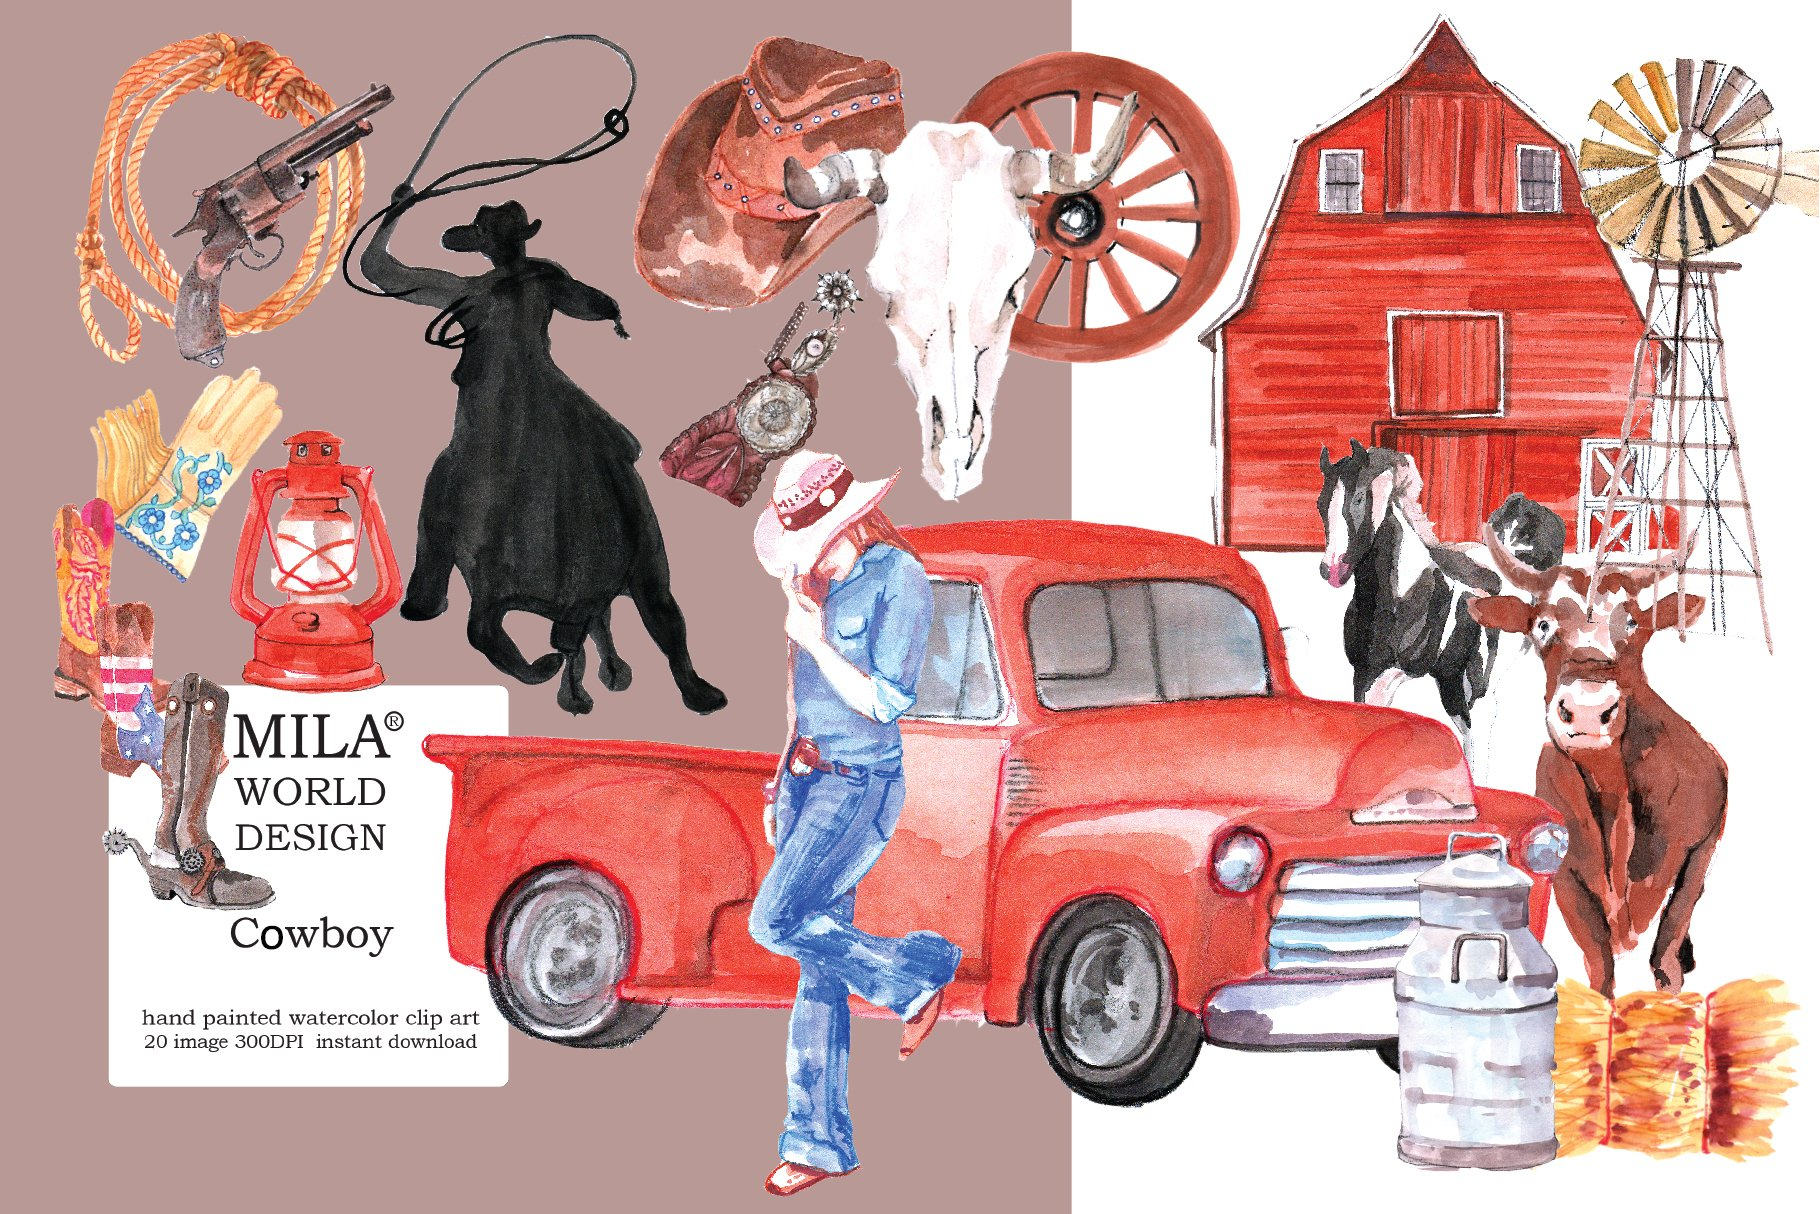 Download Watercolor Cowboy Clipart 67900 Illustrations Design Bundles